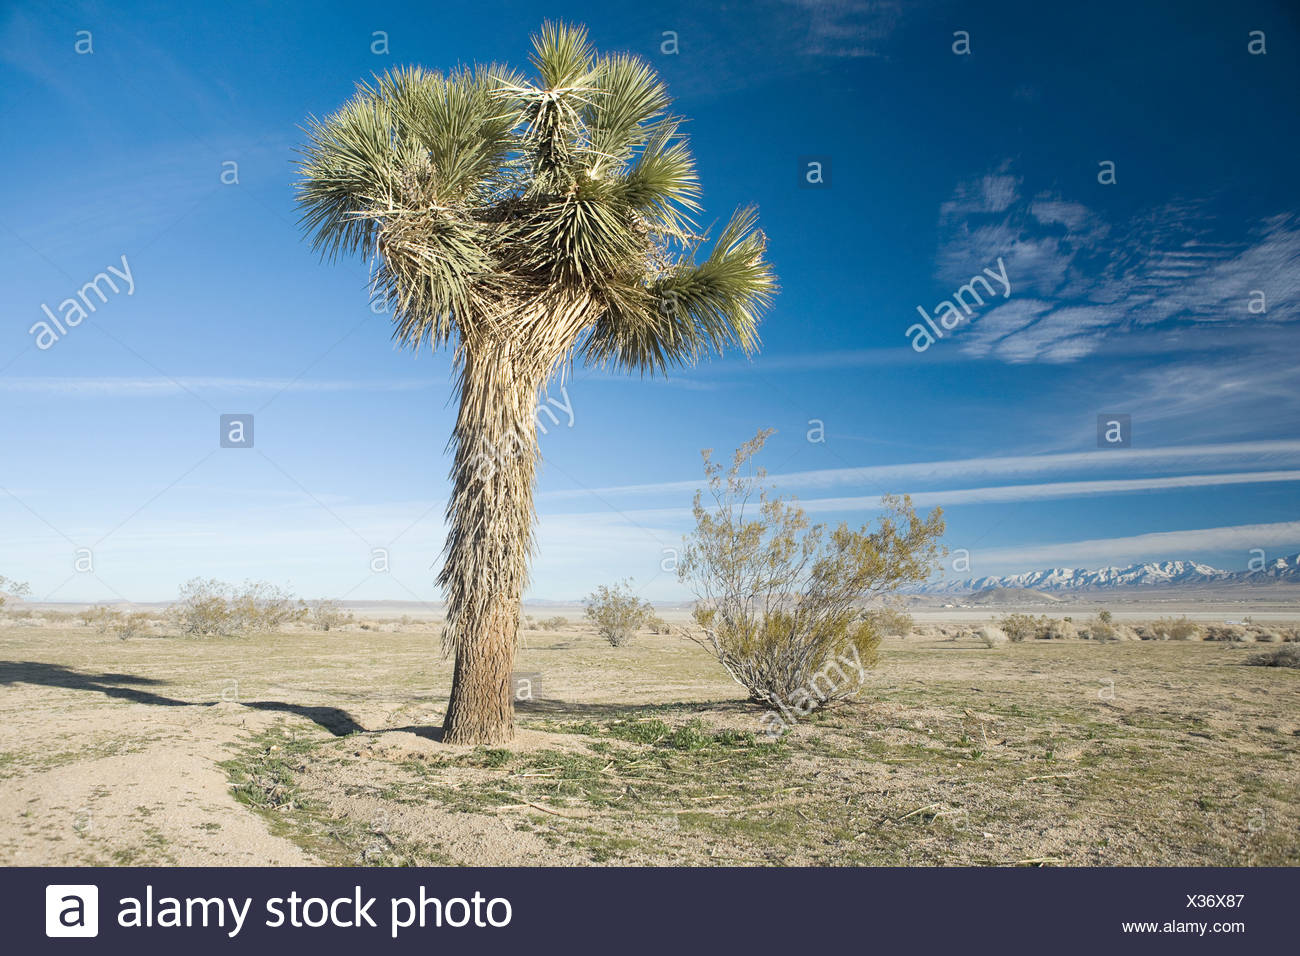 Tree on the Californian salt flats - Stock Image